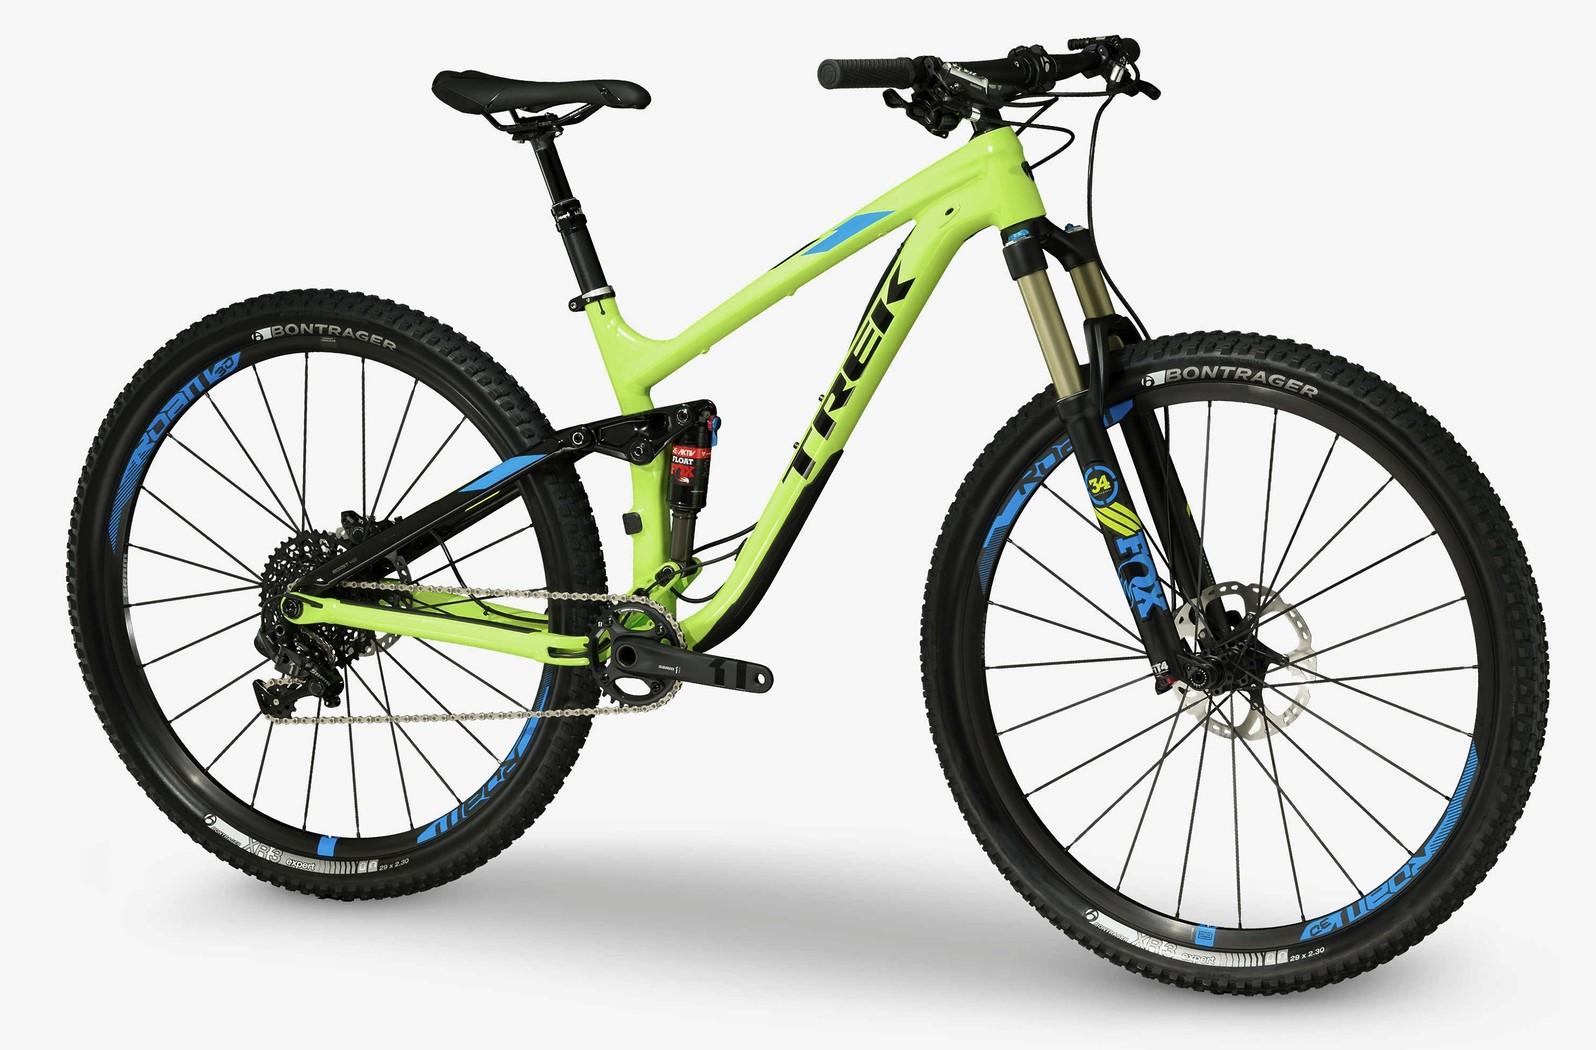 U P S Diagram Excellent Electrical Wiring House Ups Circuit Ppt 2016 Trek Fuel Ex 9 29 Reviews Comparisons Specs Mountain Bikes Vital Mtb Digram N Plus 1